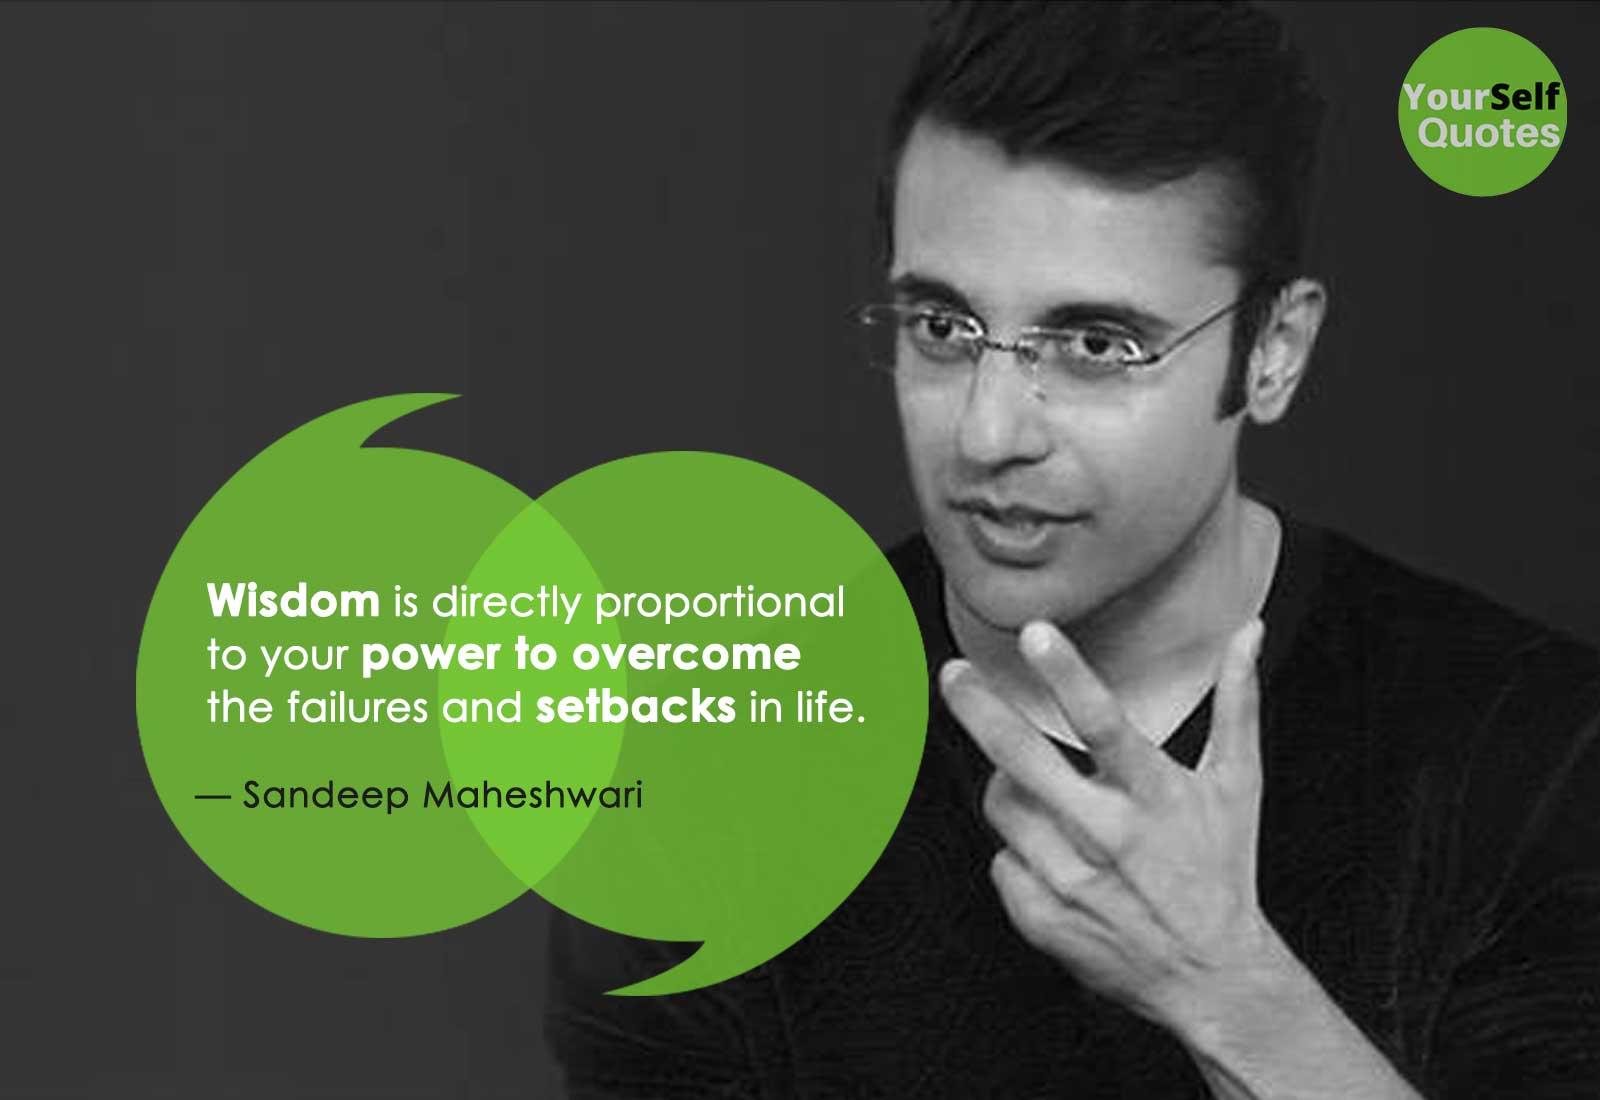 Sandeep Maheshwari Wisdom Quotes